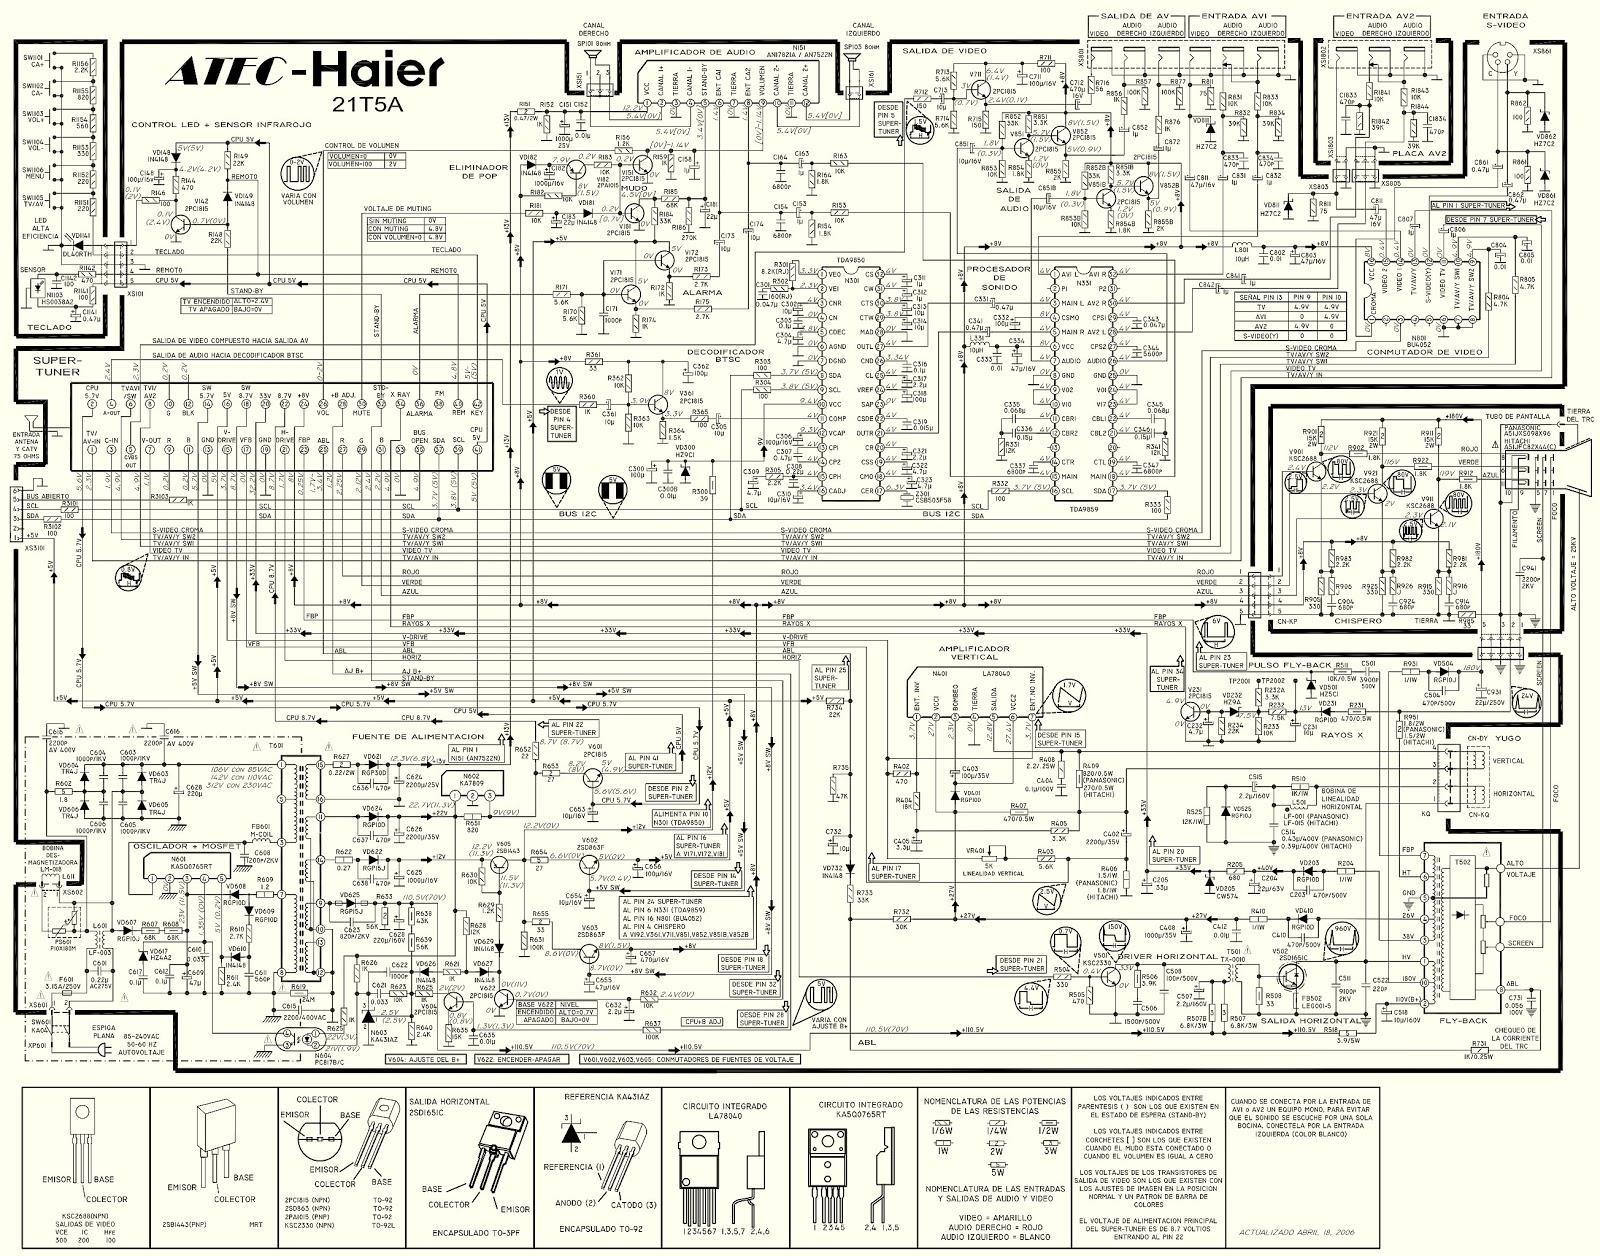 haier wiring diagram wiring diagram data apc wiring diagram haier wiring diagram wiring diagram tutorial haier [ 1600 x 1256 Pixel ]